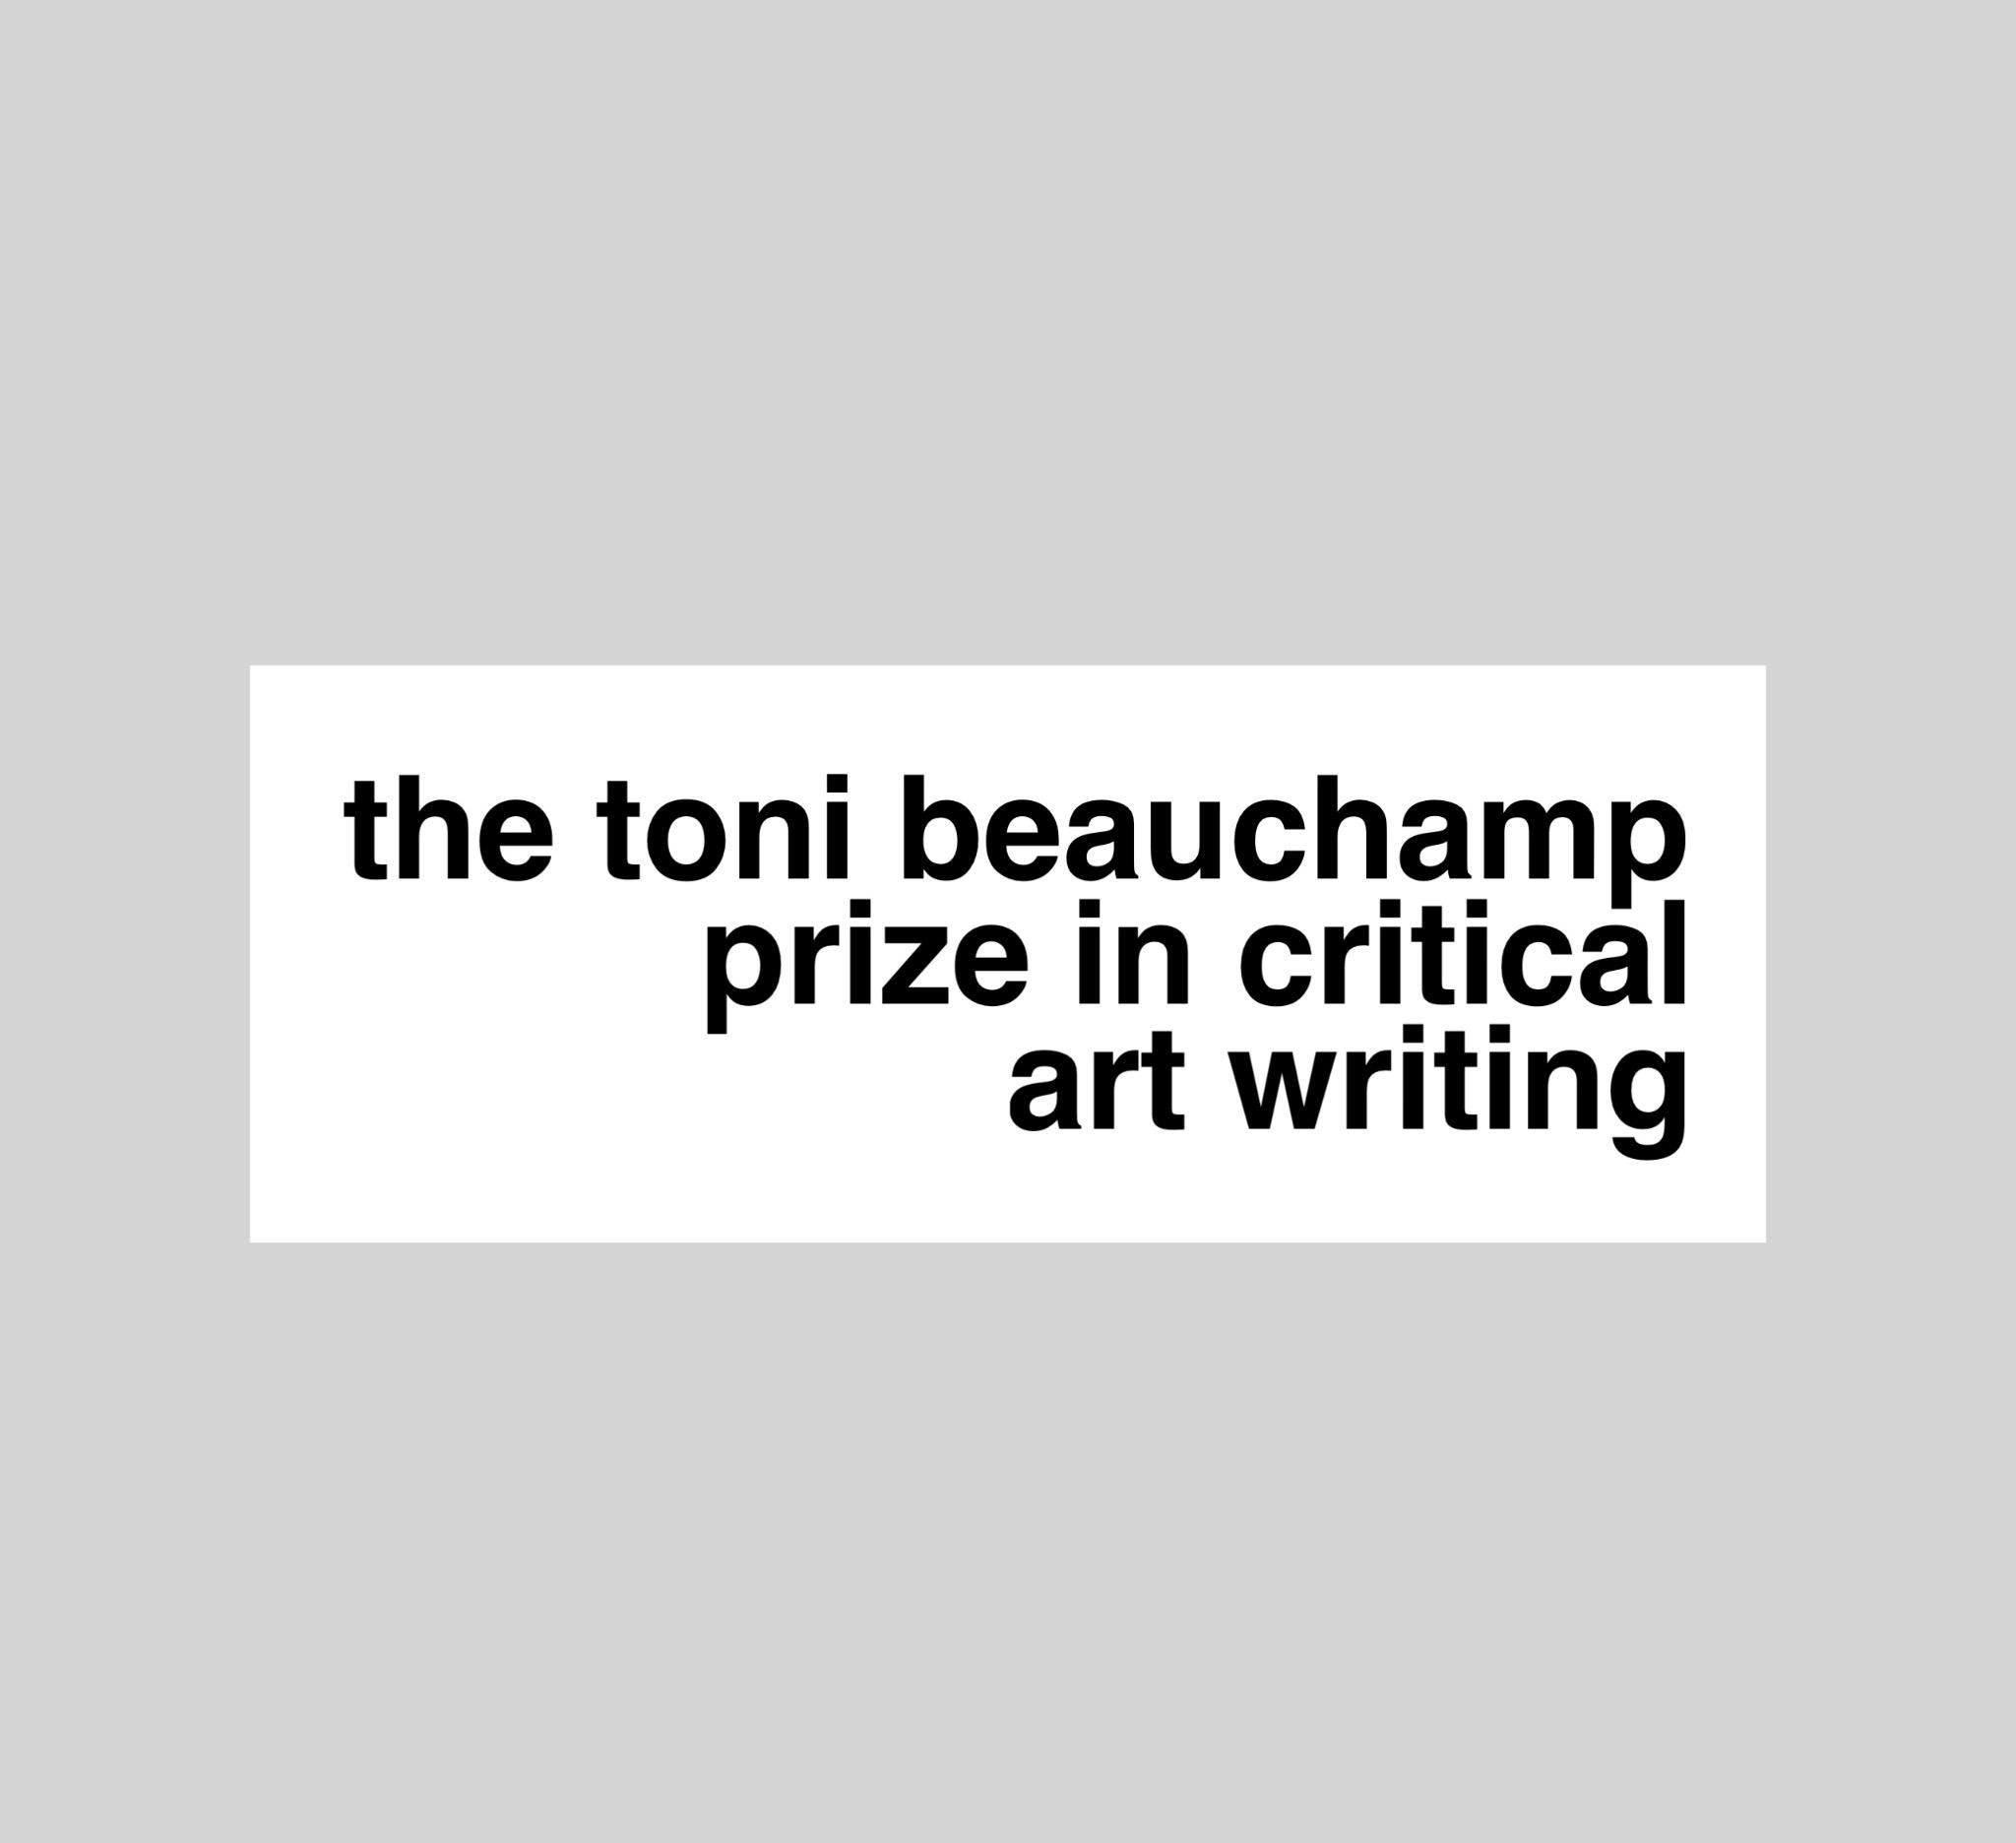 Toni Beauchamp Prize in Critical Art Writing